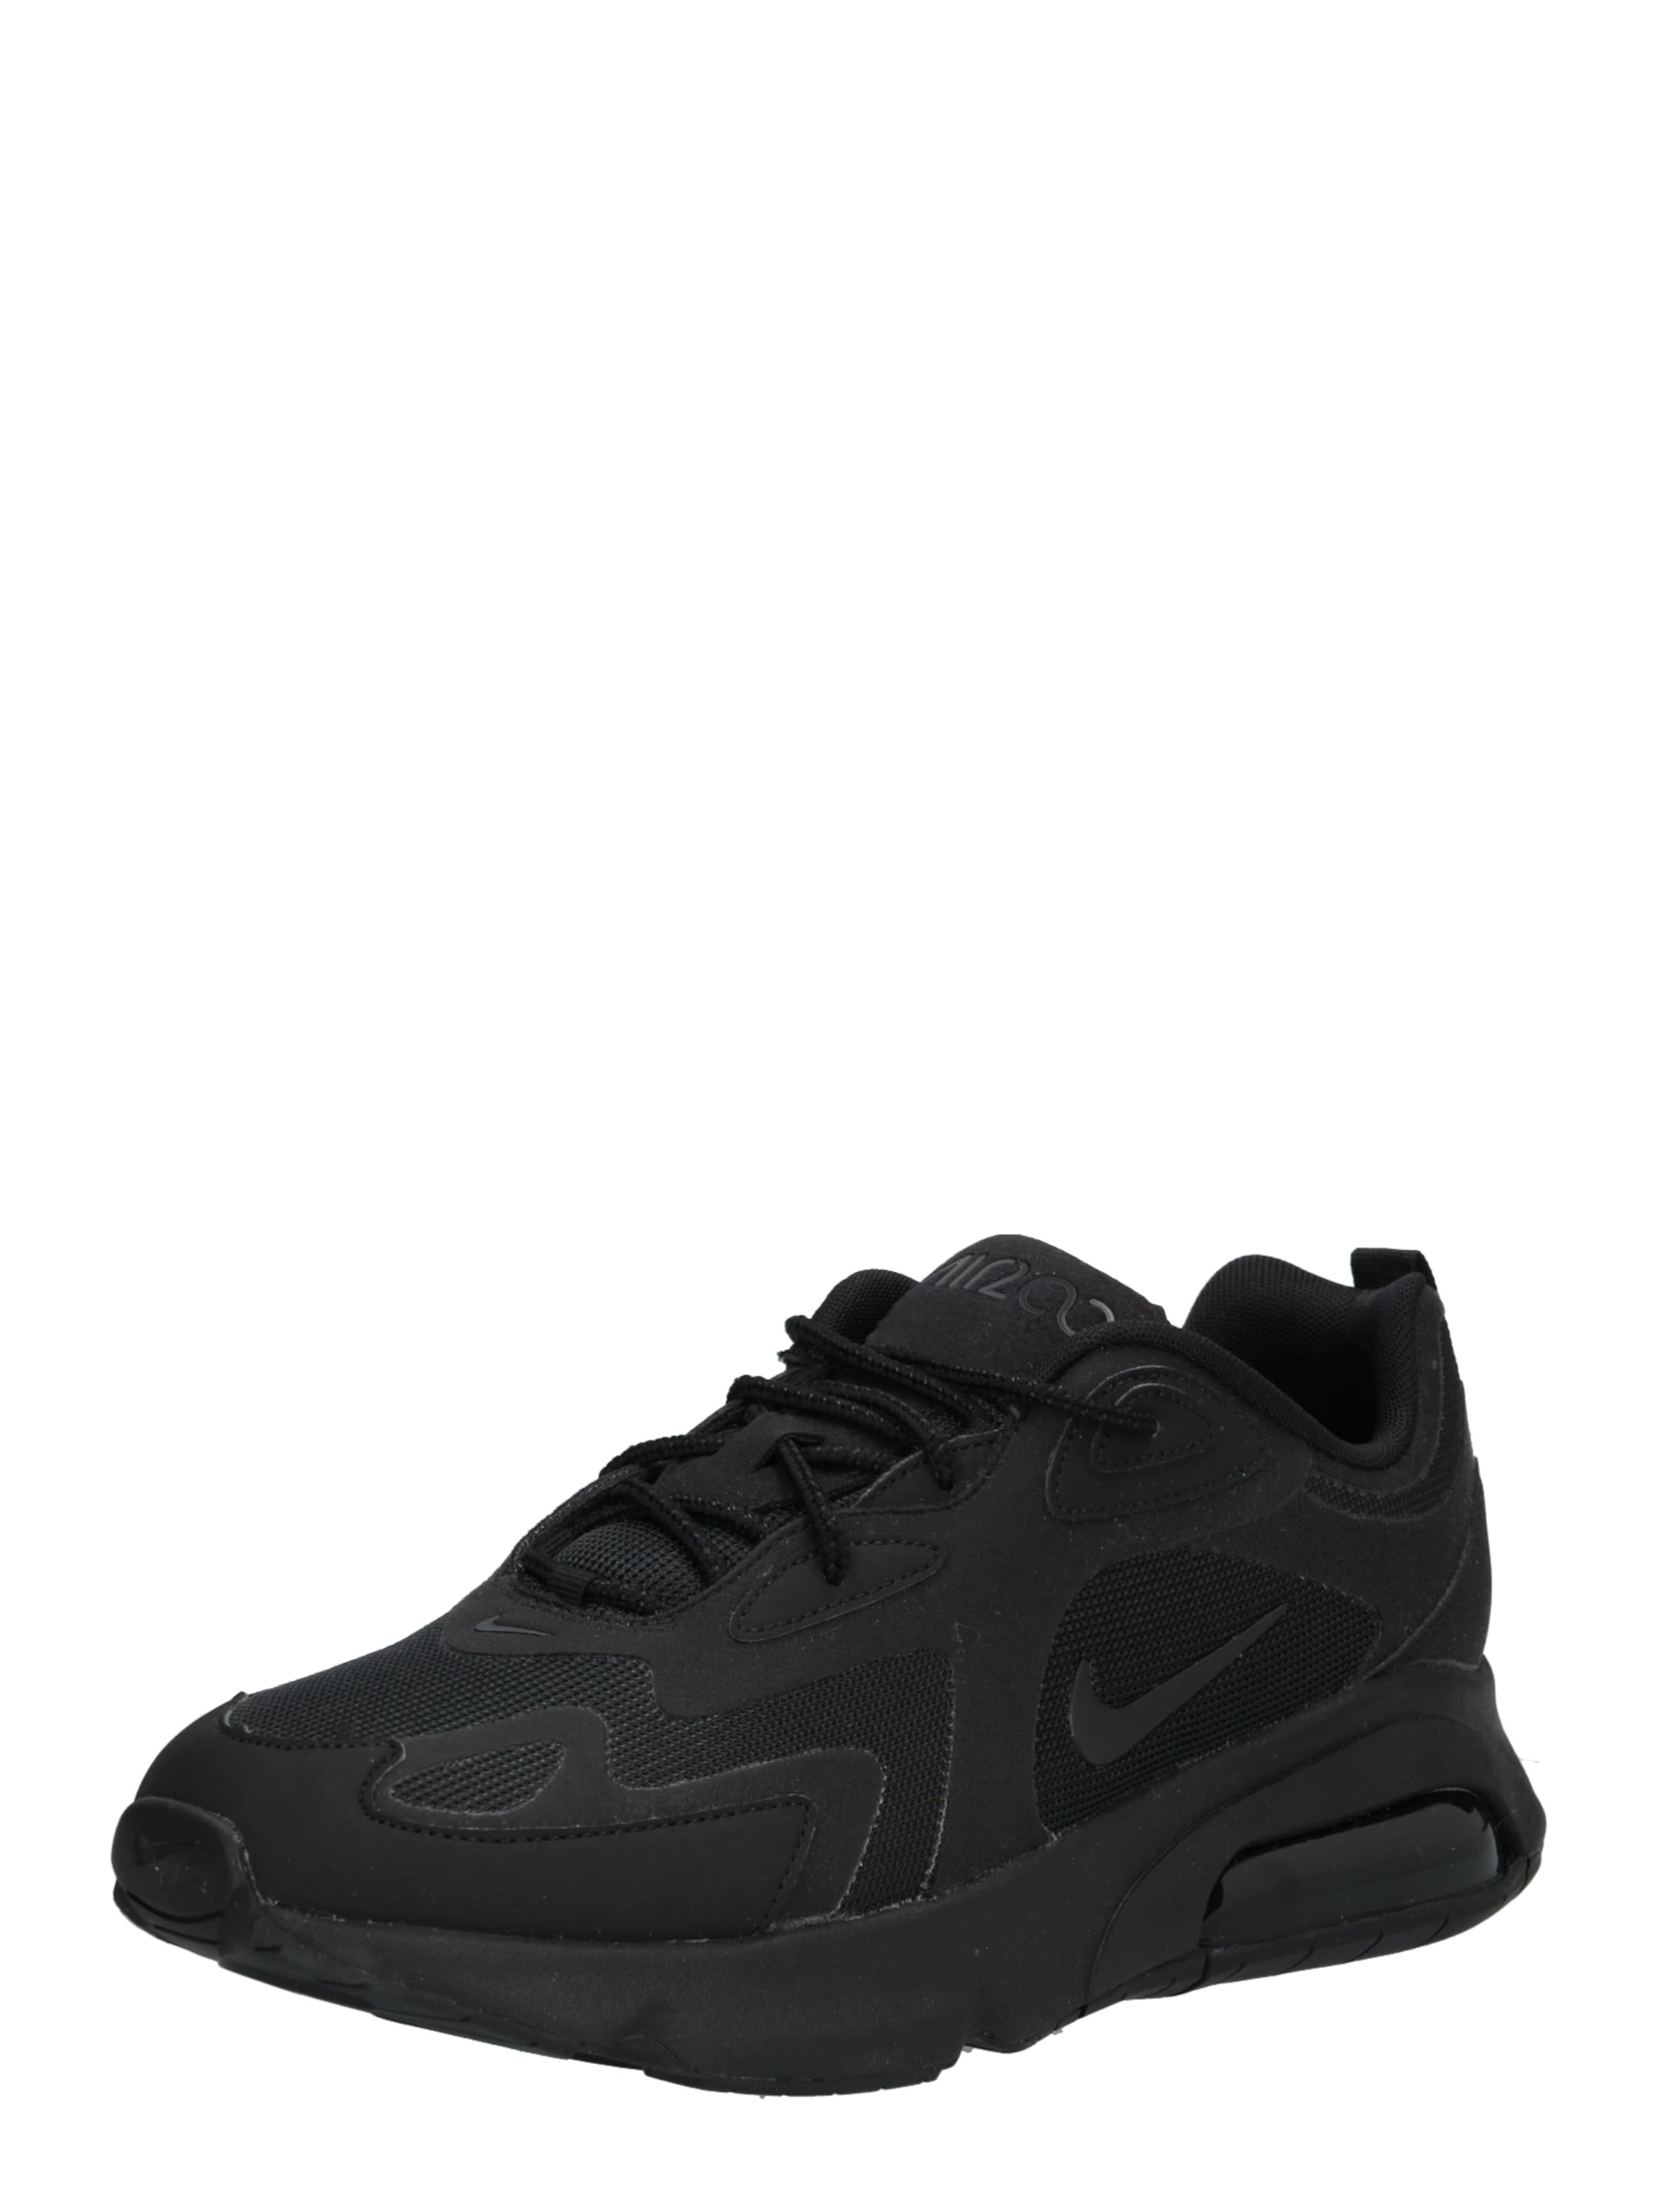 Sneaker In 'air SchwarzWeiß Max 200' Nike Sportswear YbWDeH29IE